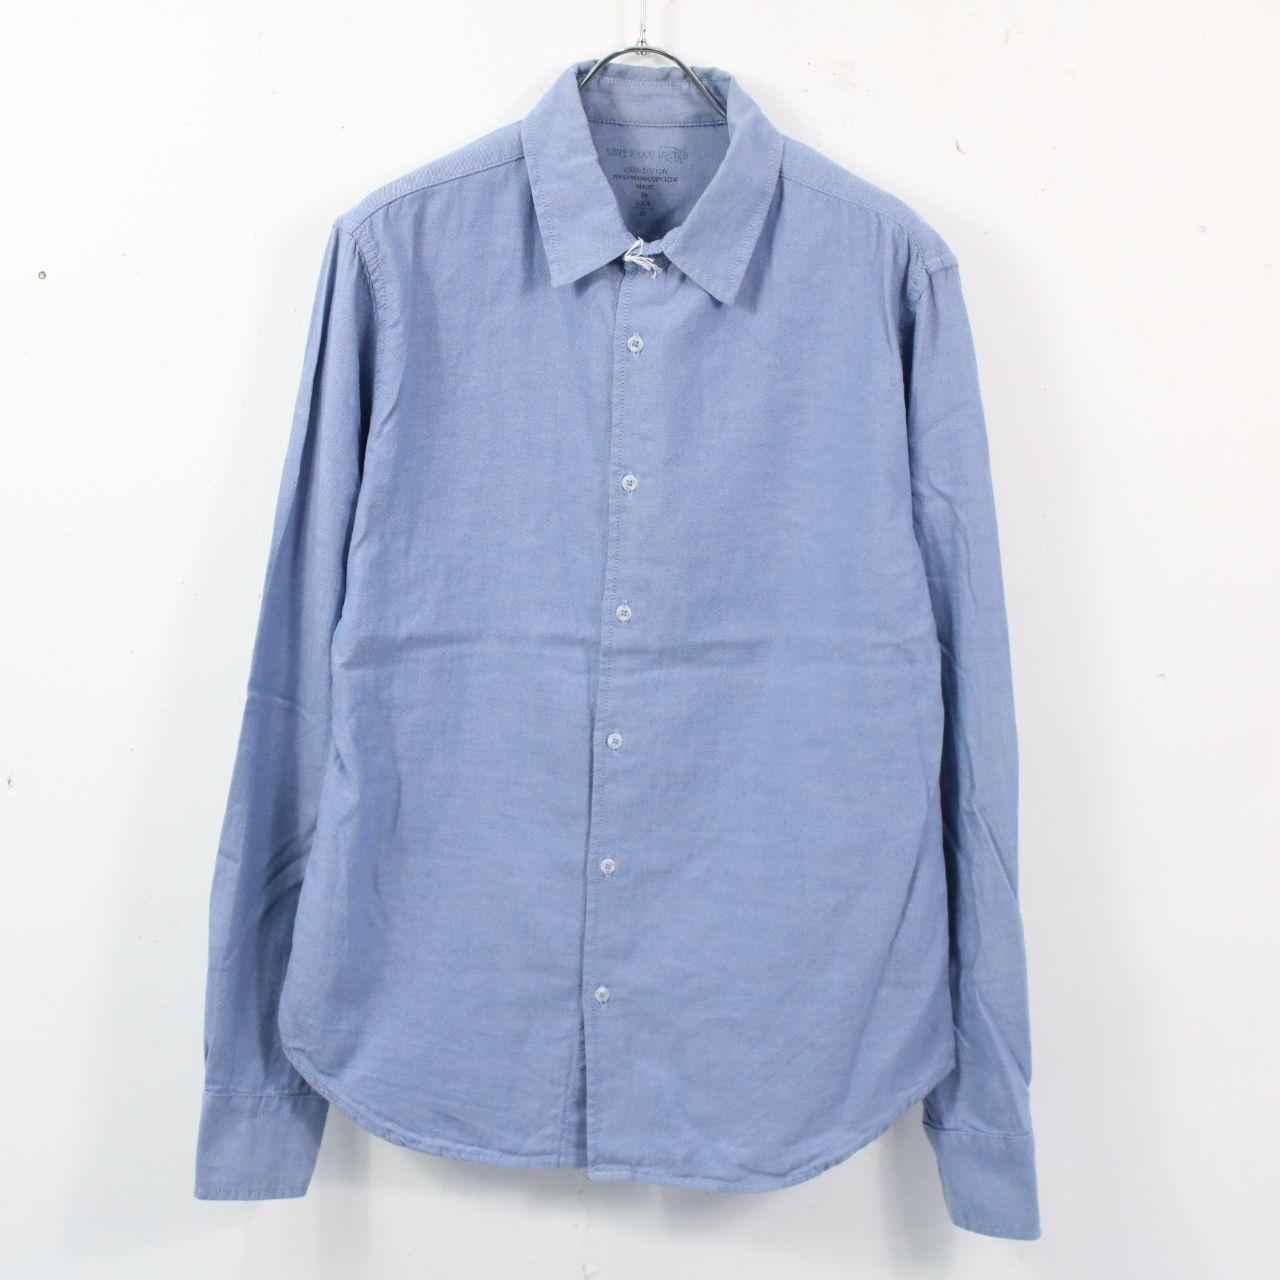 SAVE KHAKI UNITED / セーブカーキユナイテッド   オックスフォードシャツ   XS   ブルー